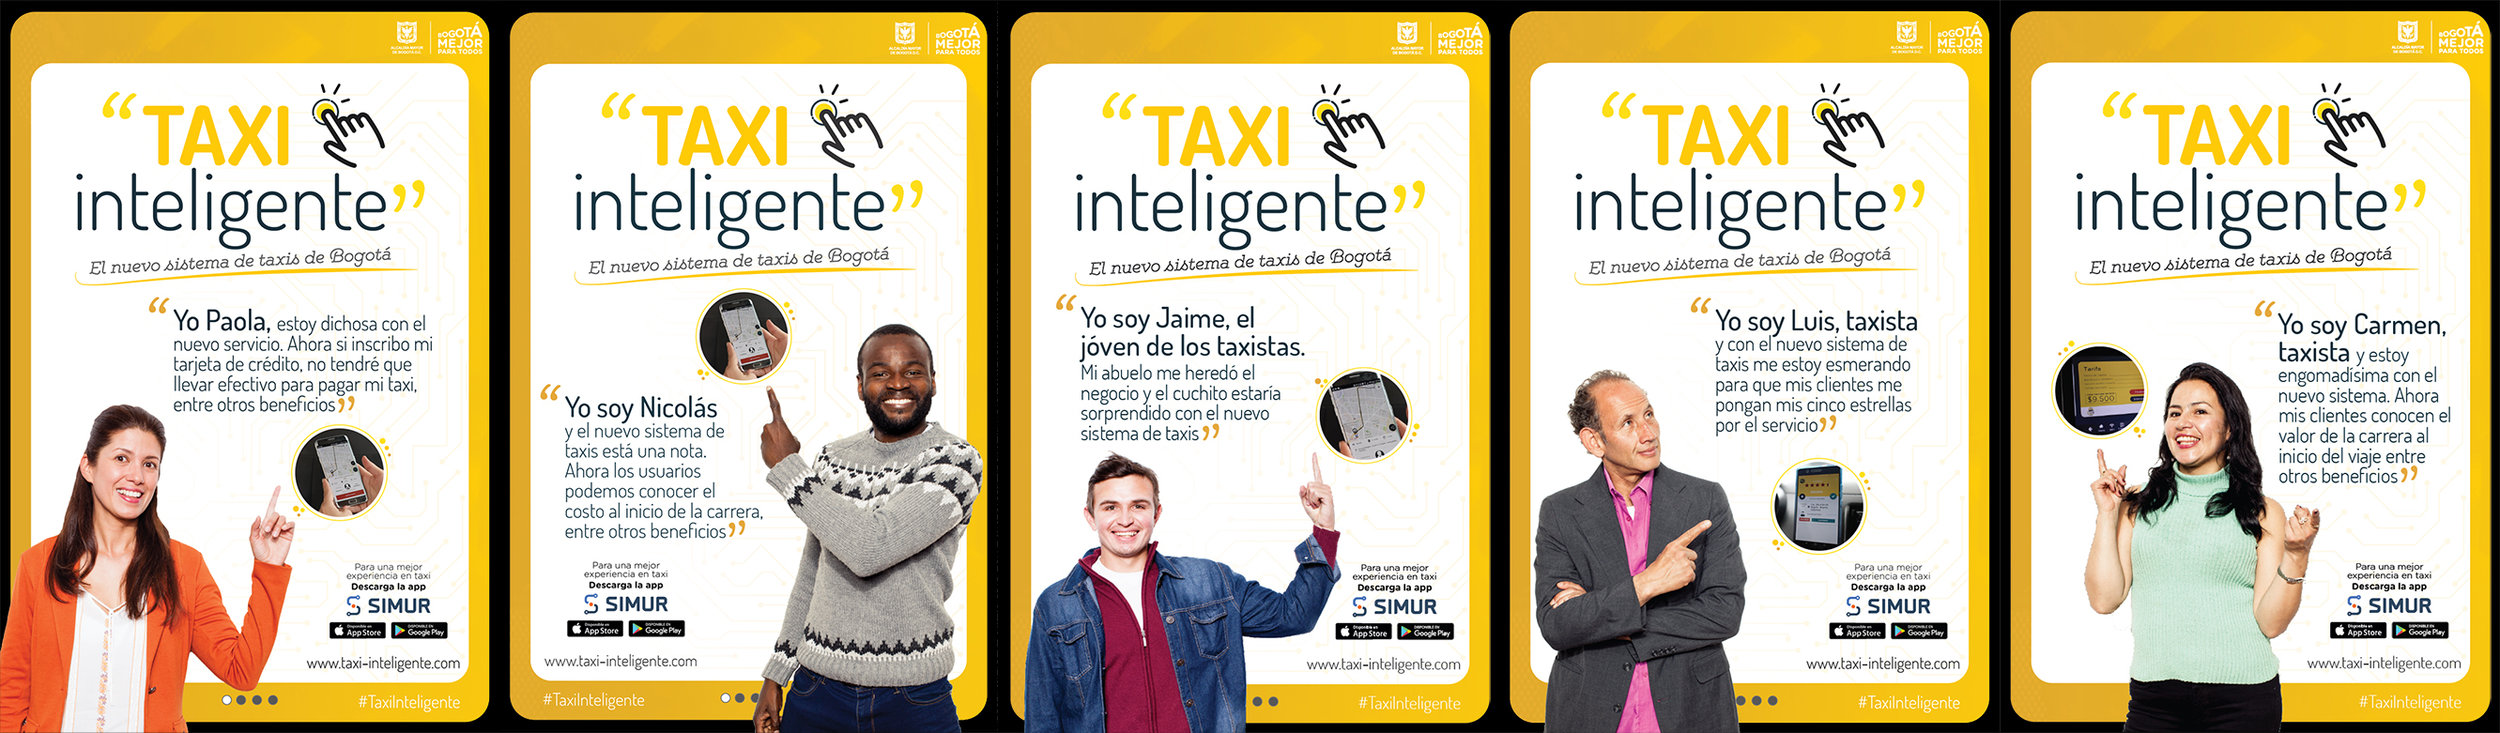 Movilidad Taxis Inteligentes.jpg